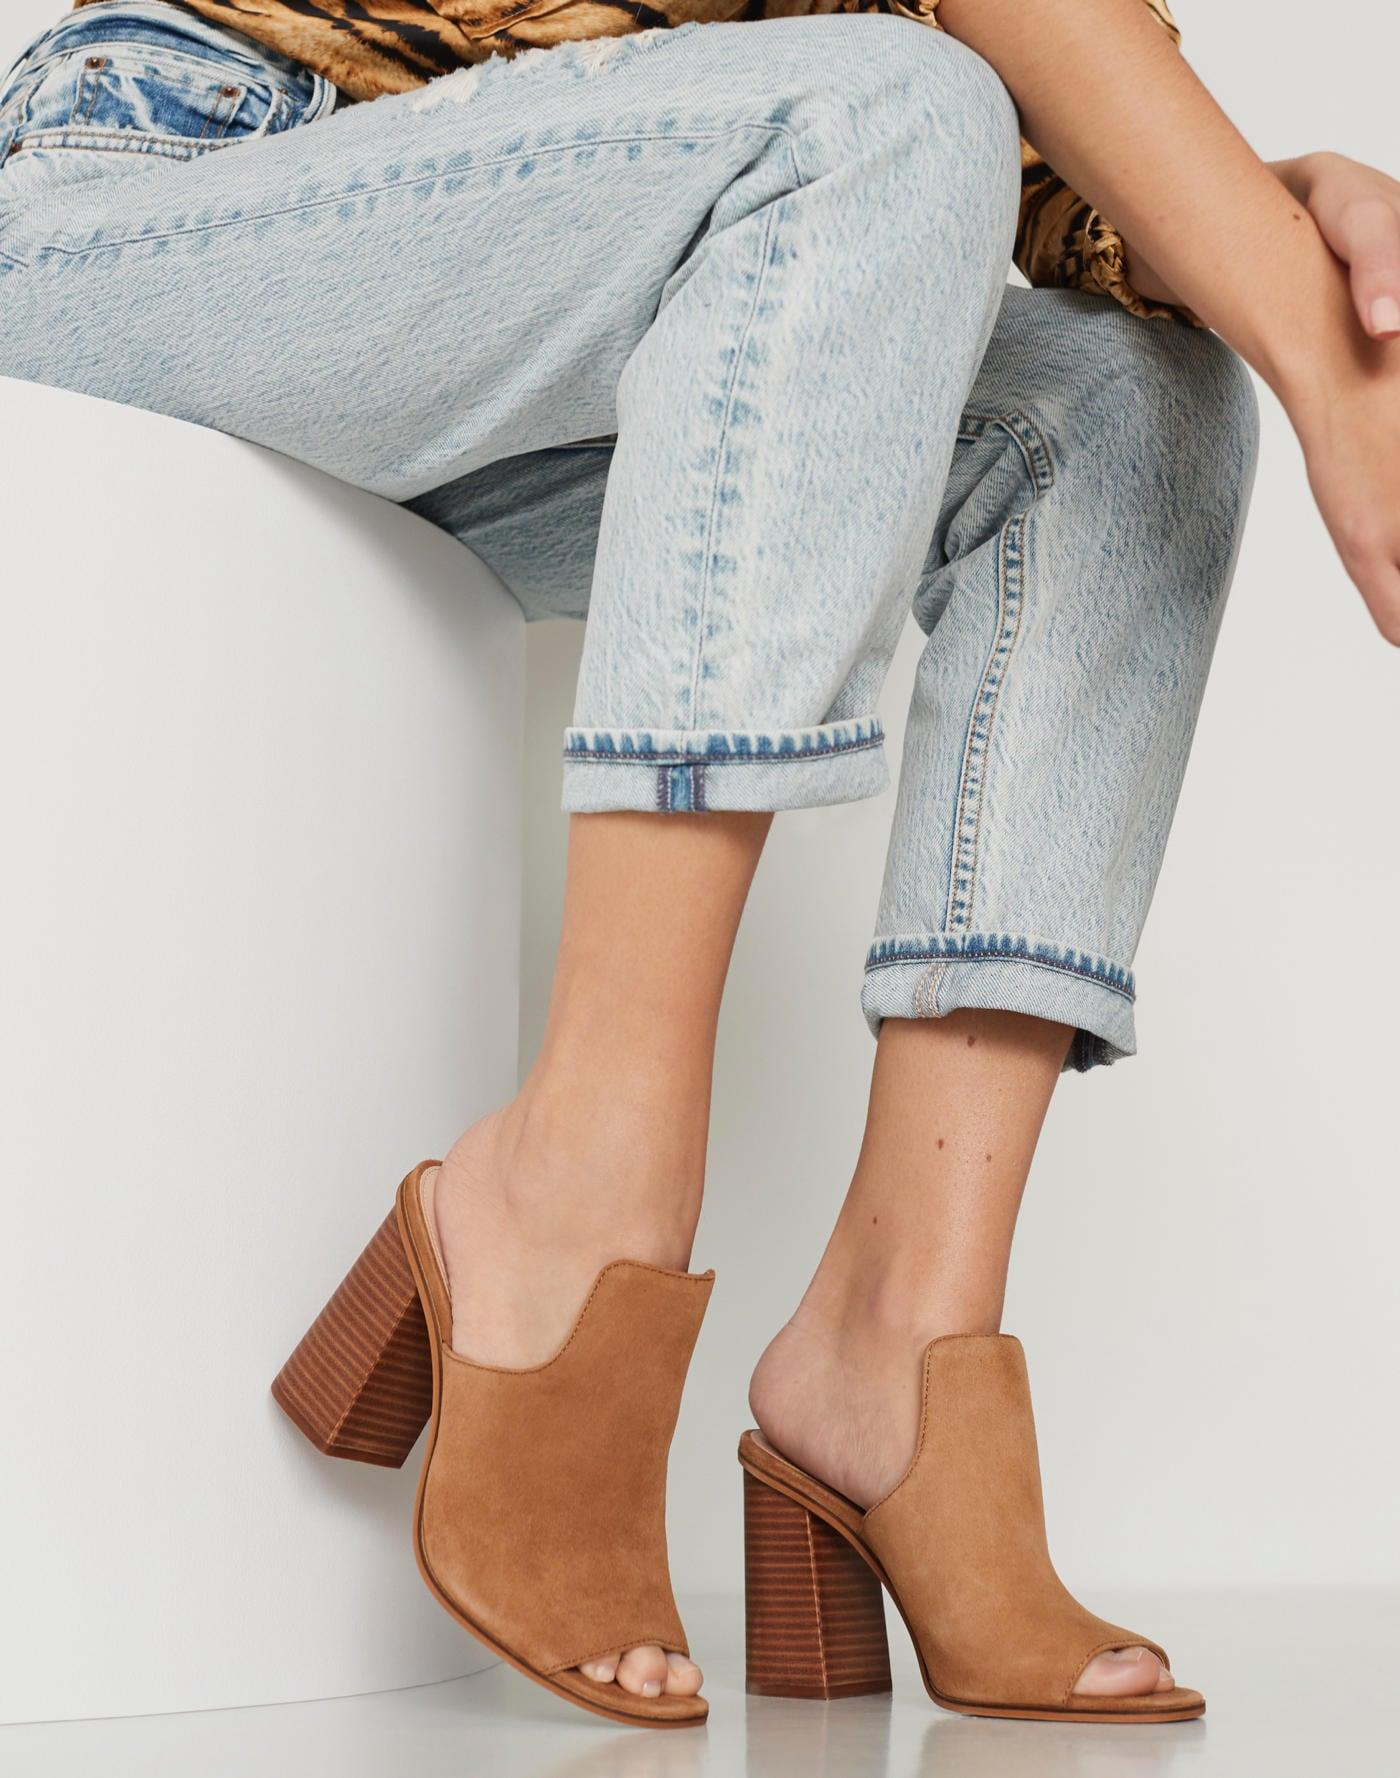 3a60edad8 Heels For Women   Stilettos & High Heels   ALDO Canada   ALDO Canada